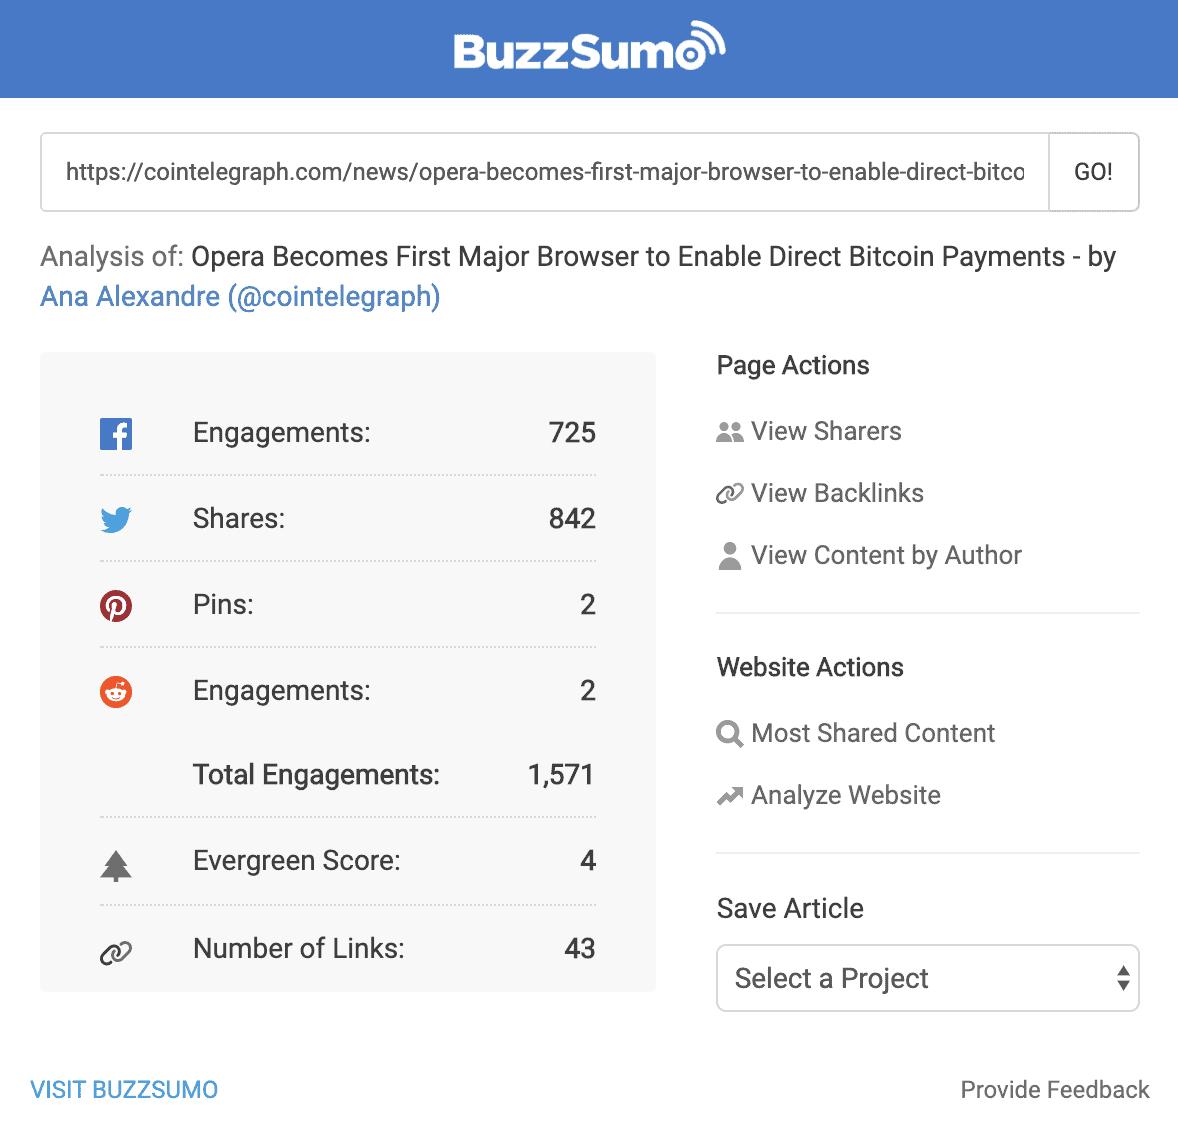 Buzzsumo Blockchain public relation engagement rate